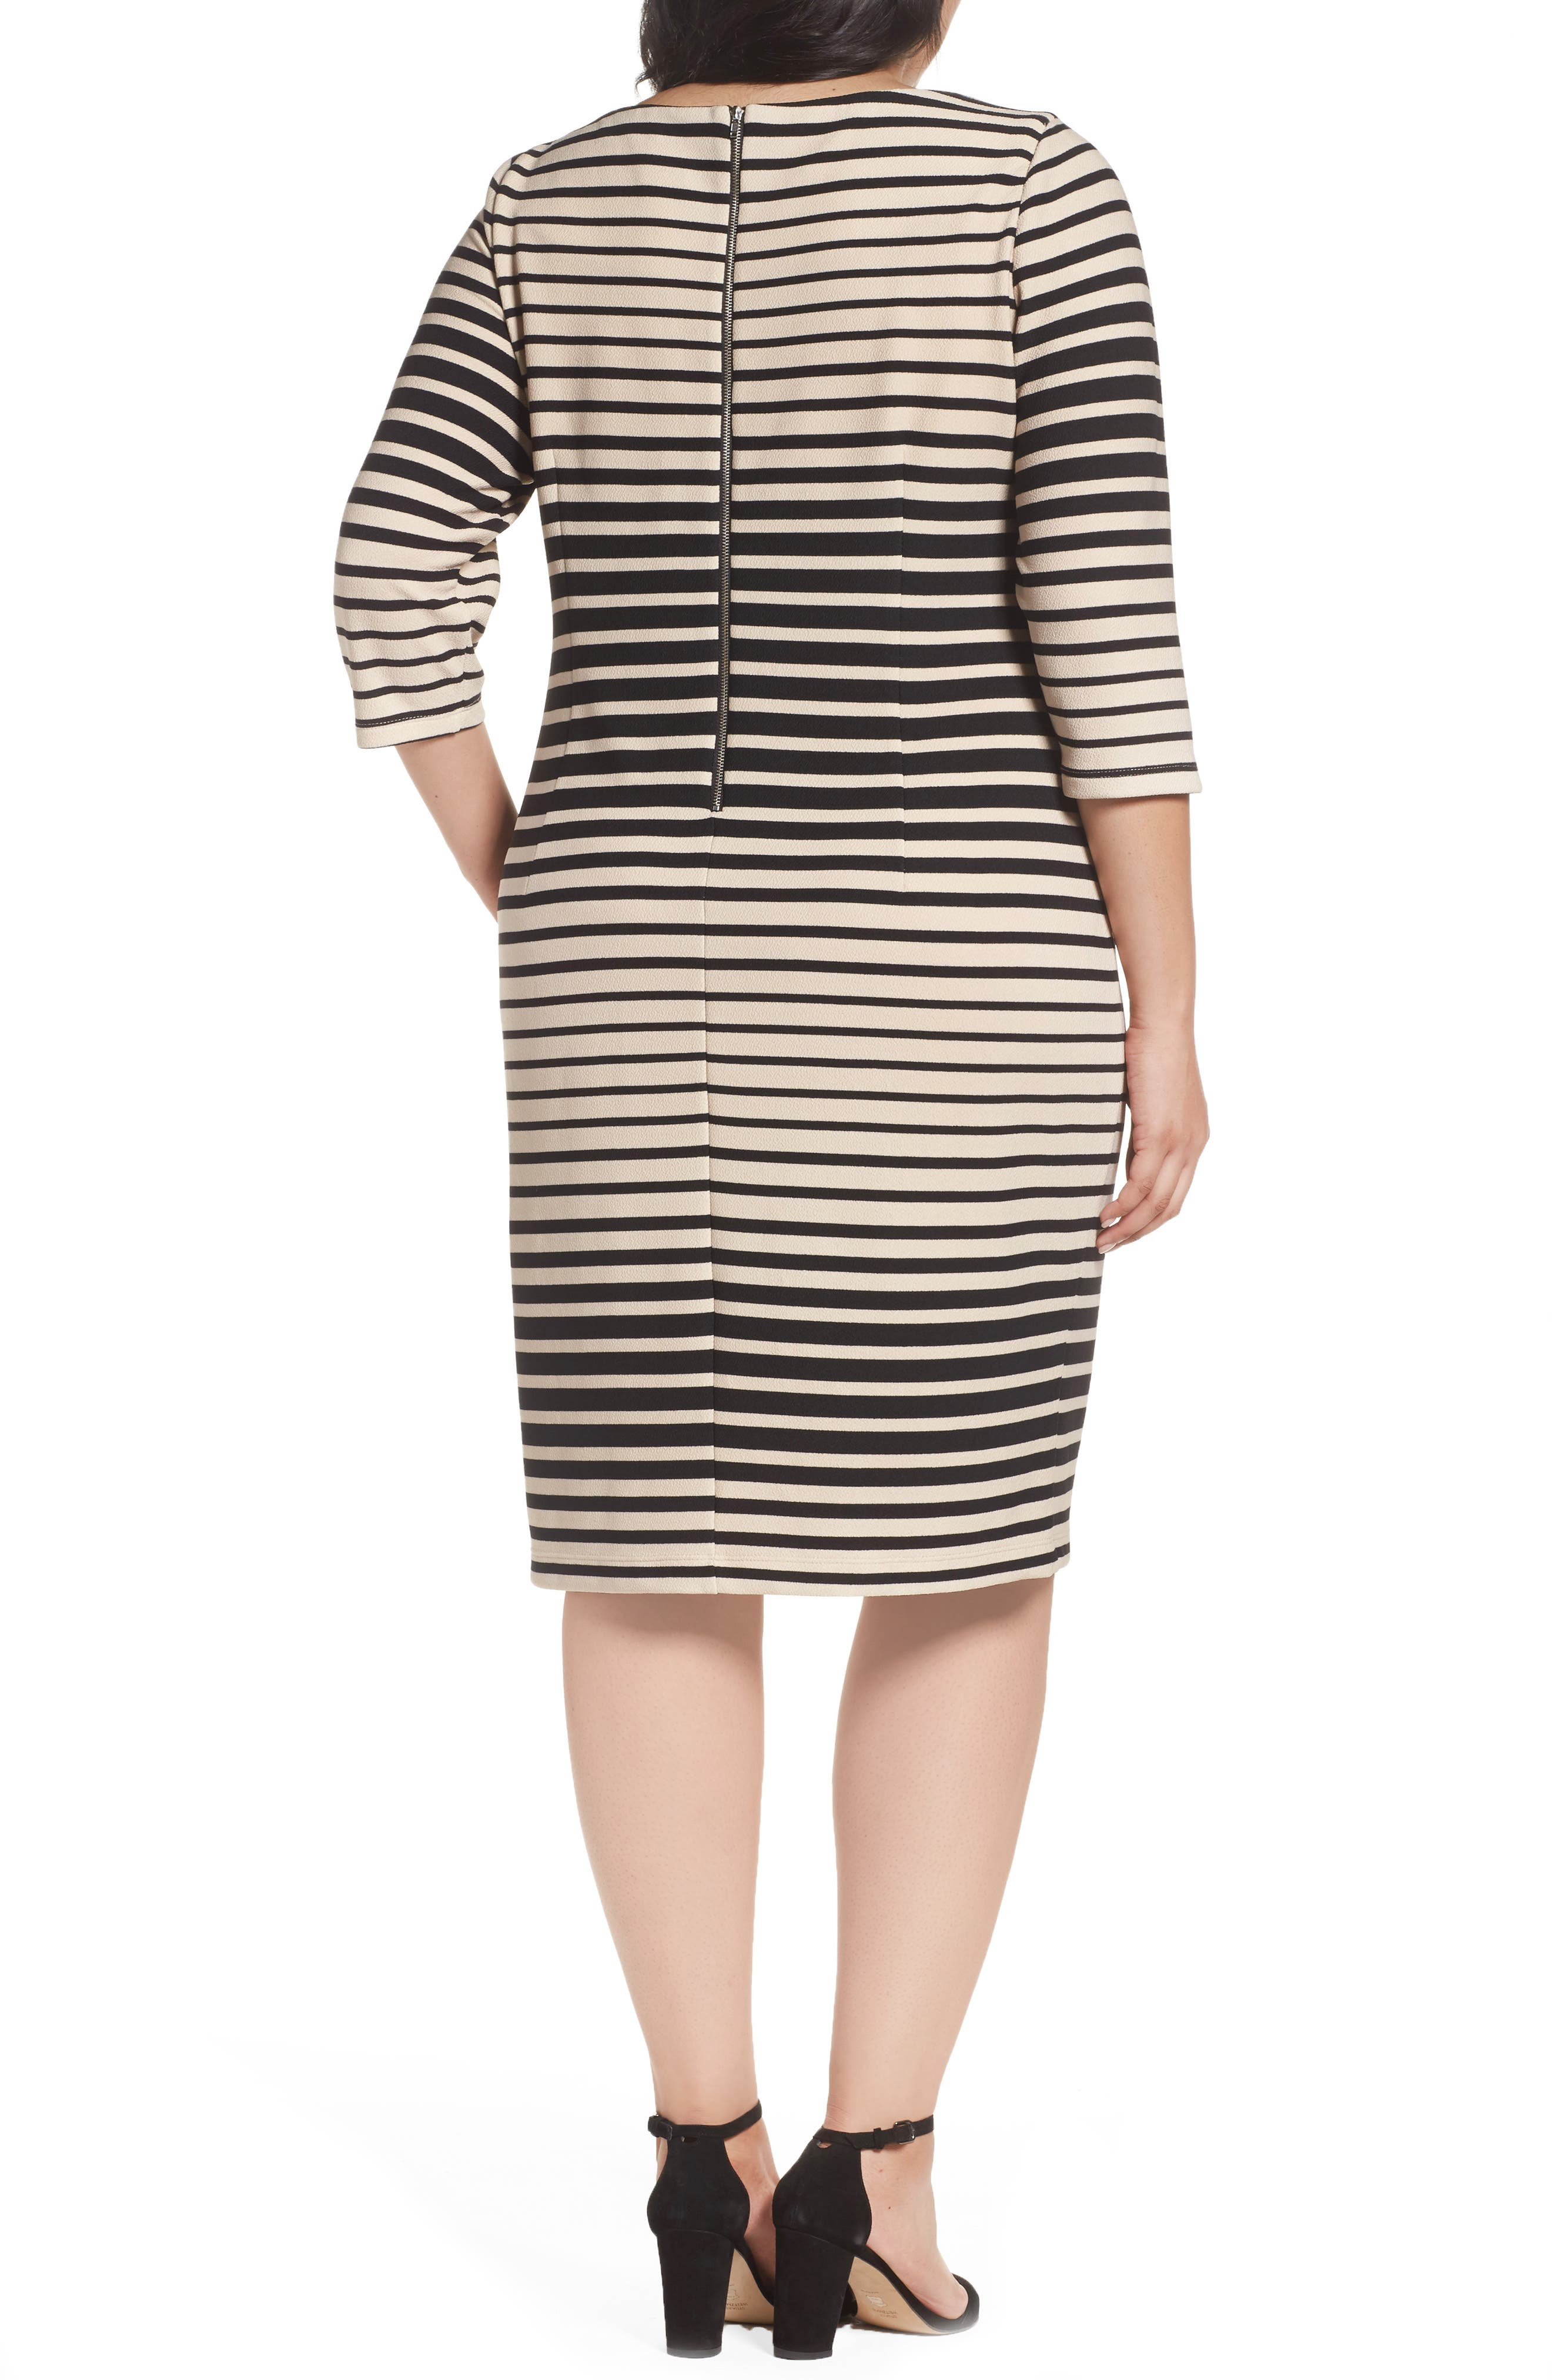 Alternate Image 2  - Gabby Skye Stripe Knit Sheath Dress (Plus Size)